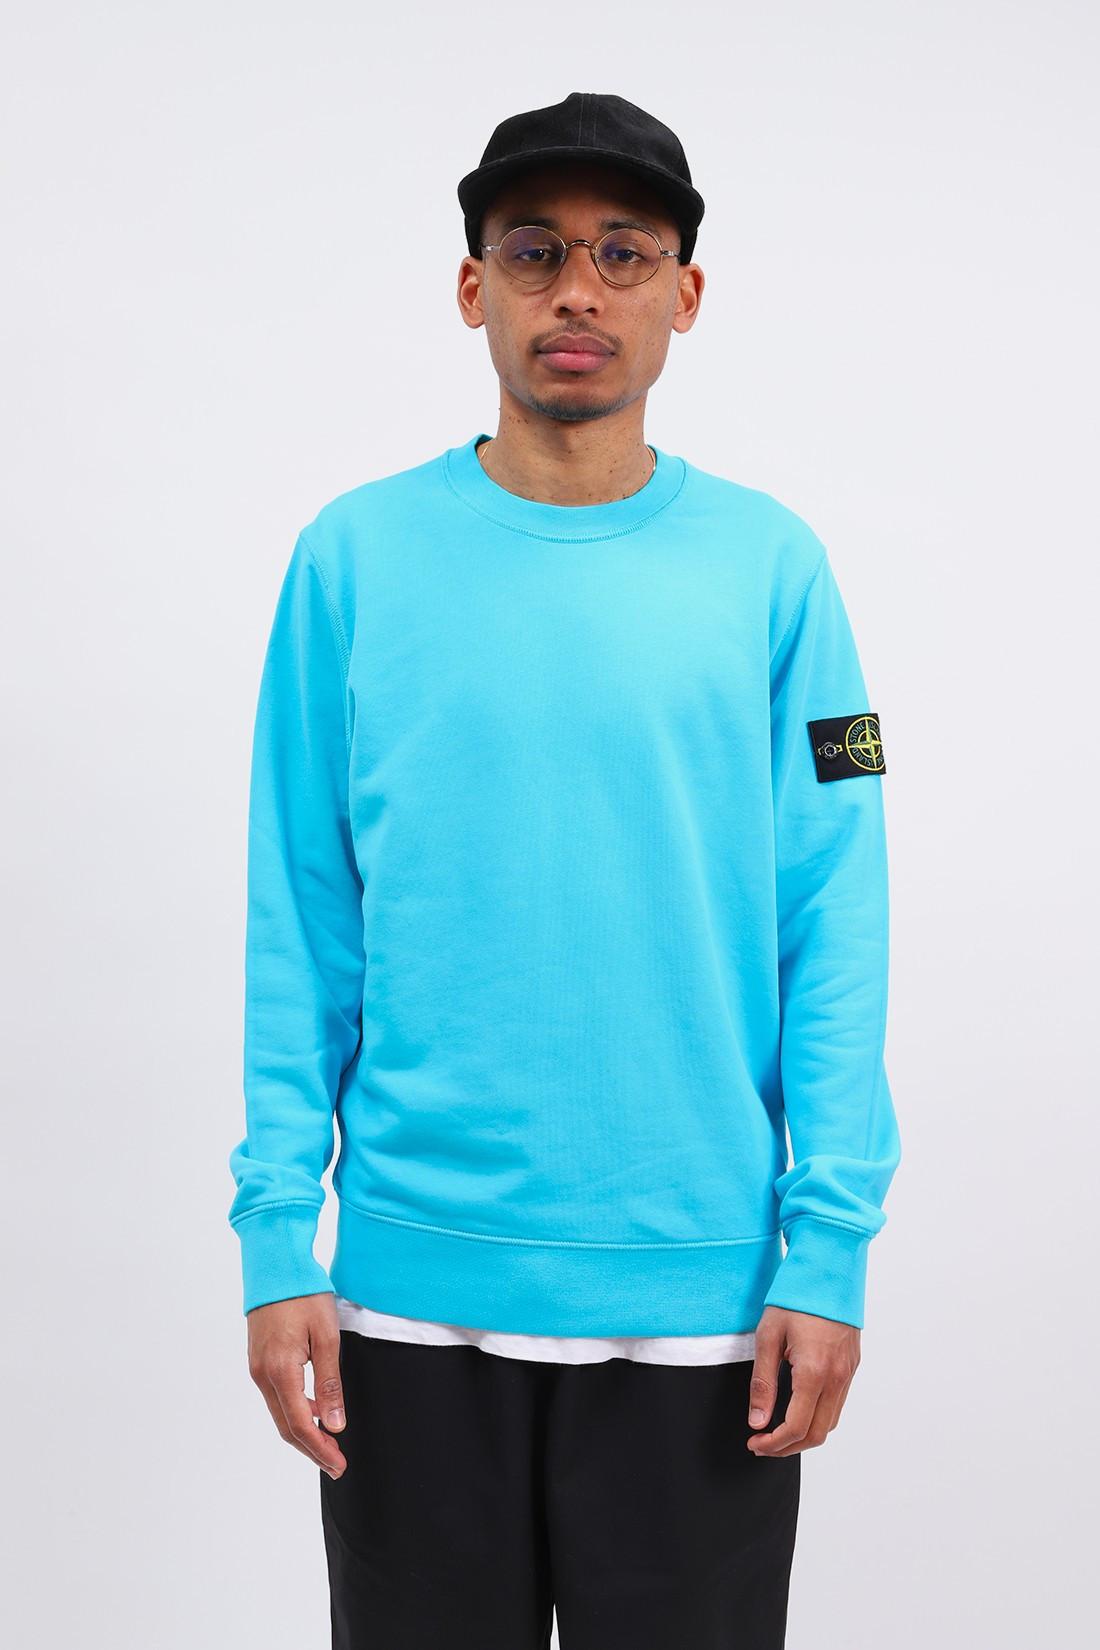 STONE ISLAND / 63051 crewneck sweater v0042 Turchese